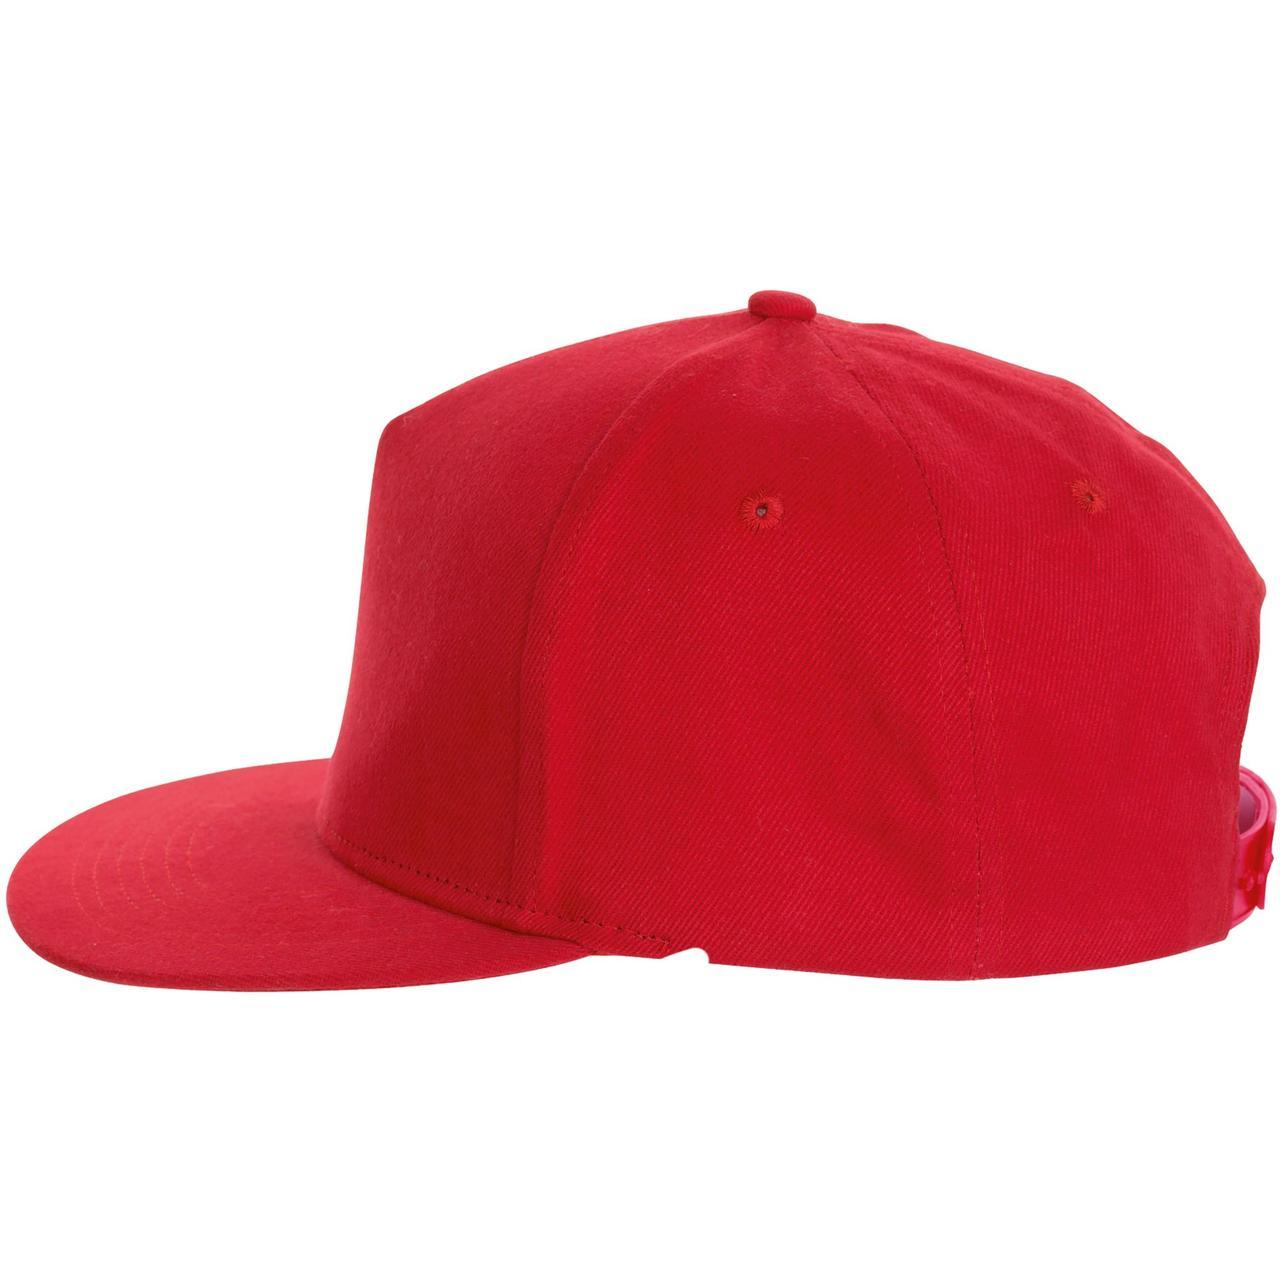 Бейсболка Sonic, красная (артикул 01661145TUN)